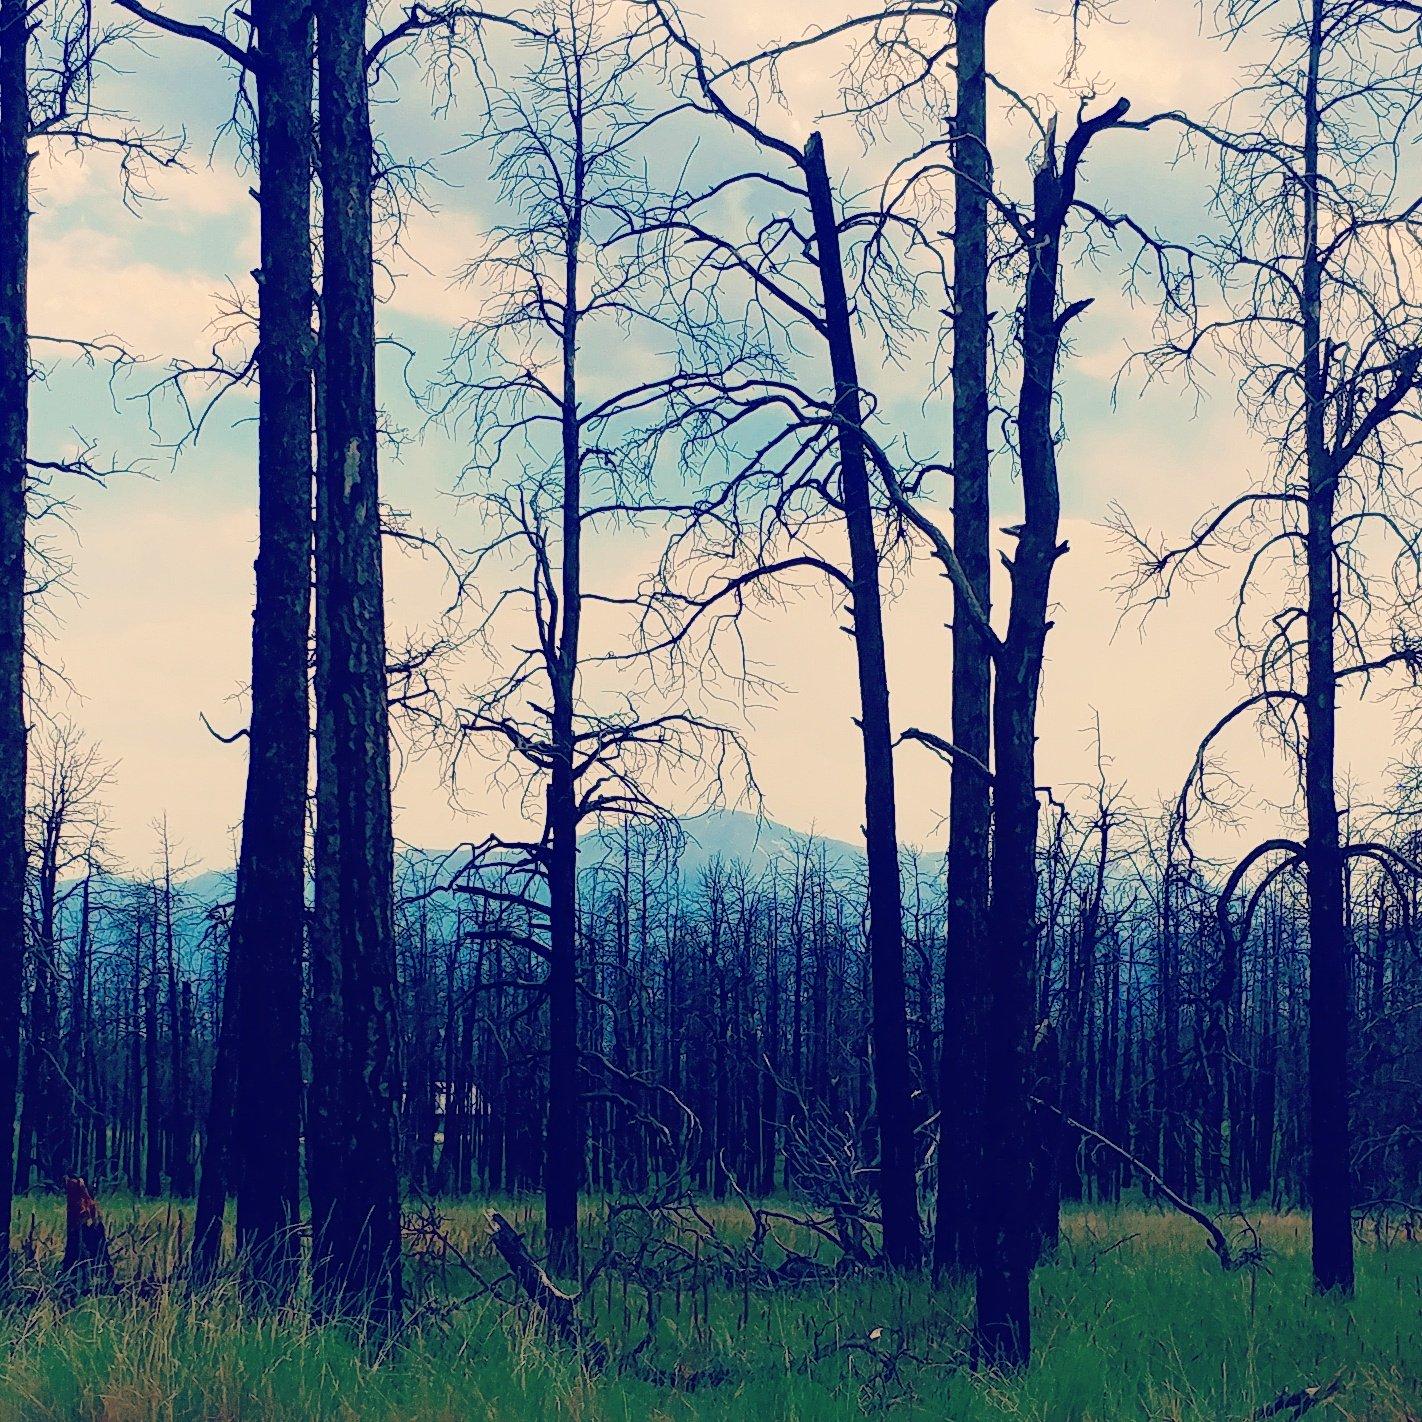 Pikes Peak as seen through the Black Forest burn scar